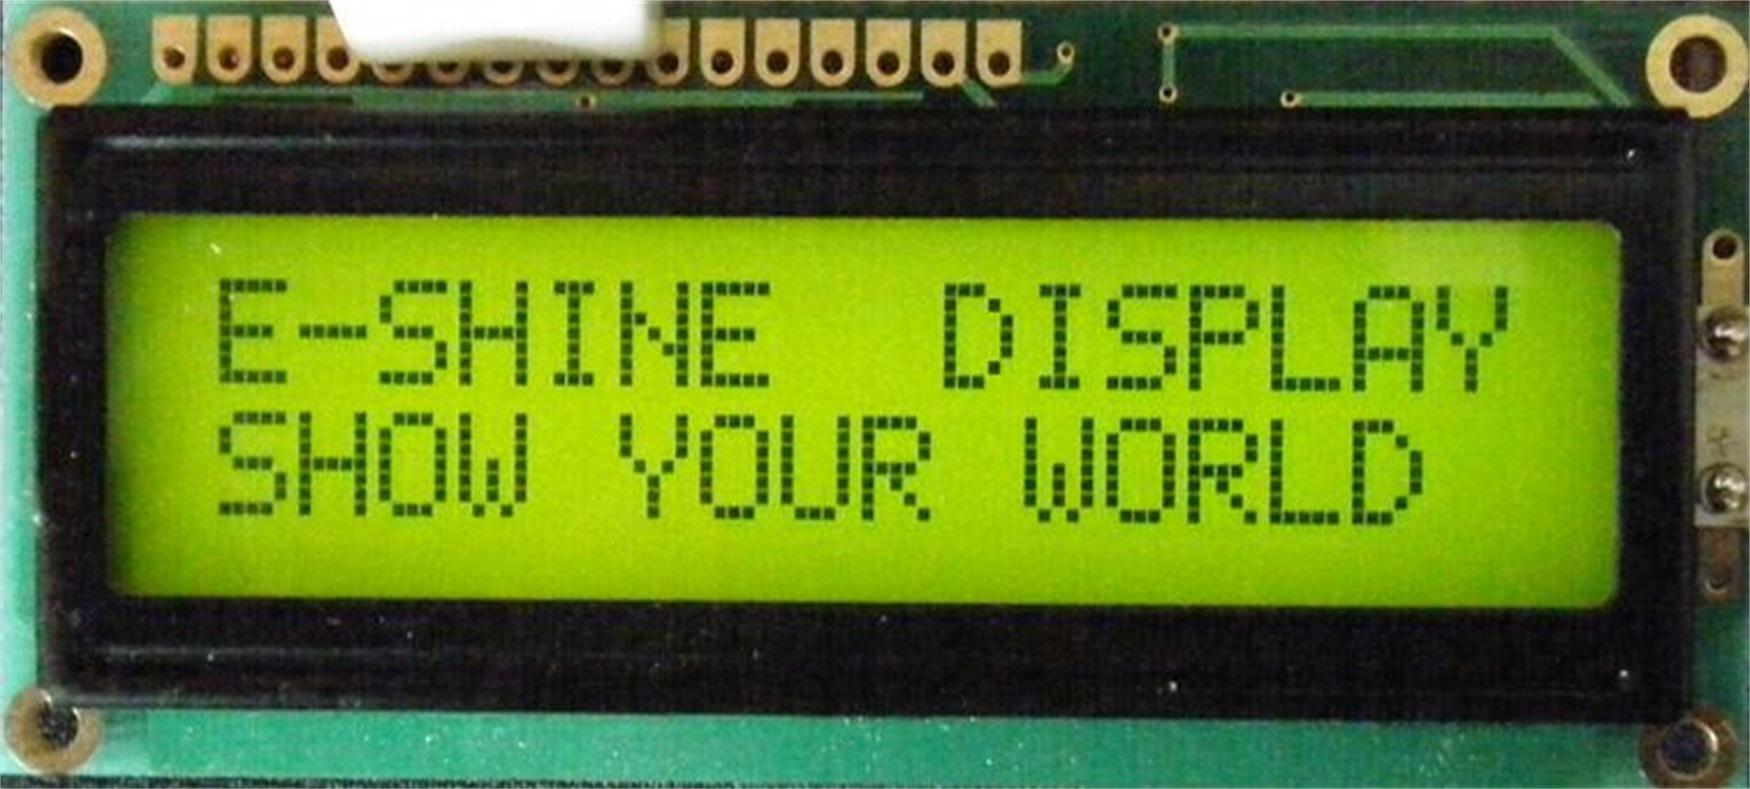 LCD Modules Stn LCD Character COB EC1602A0